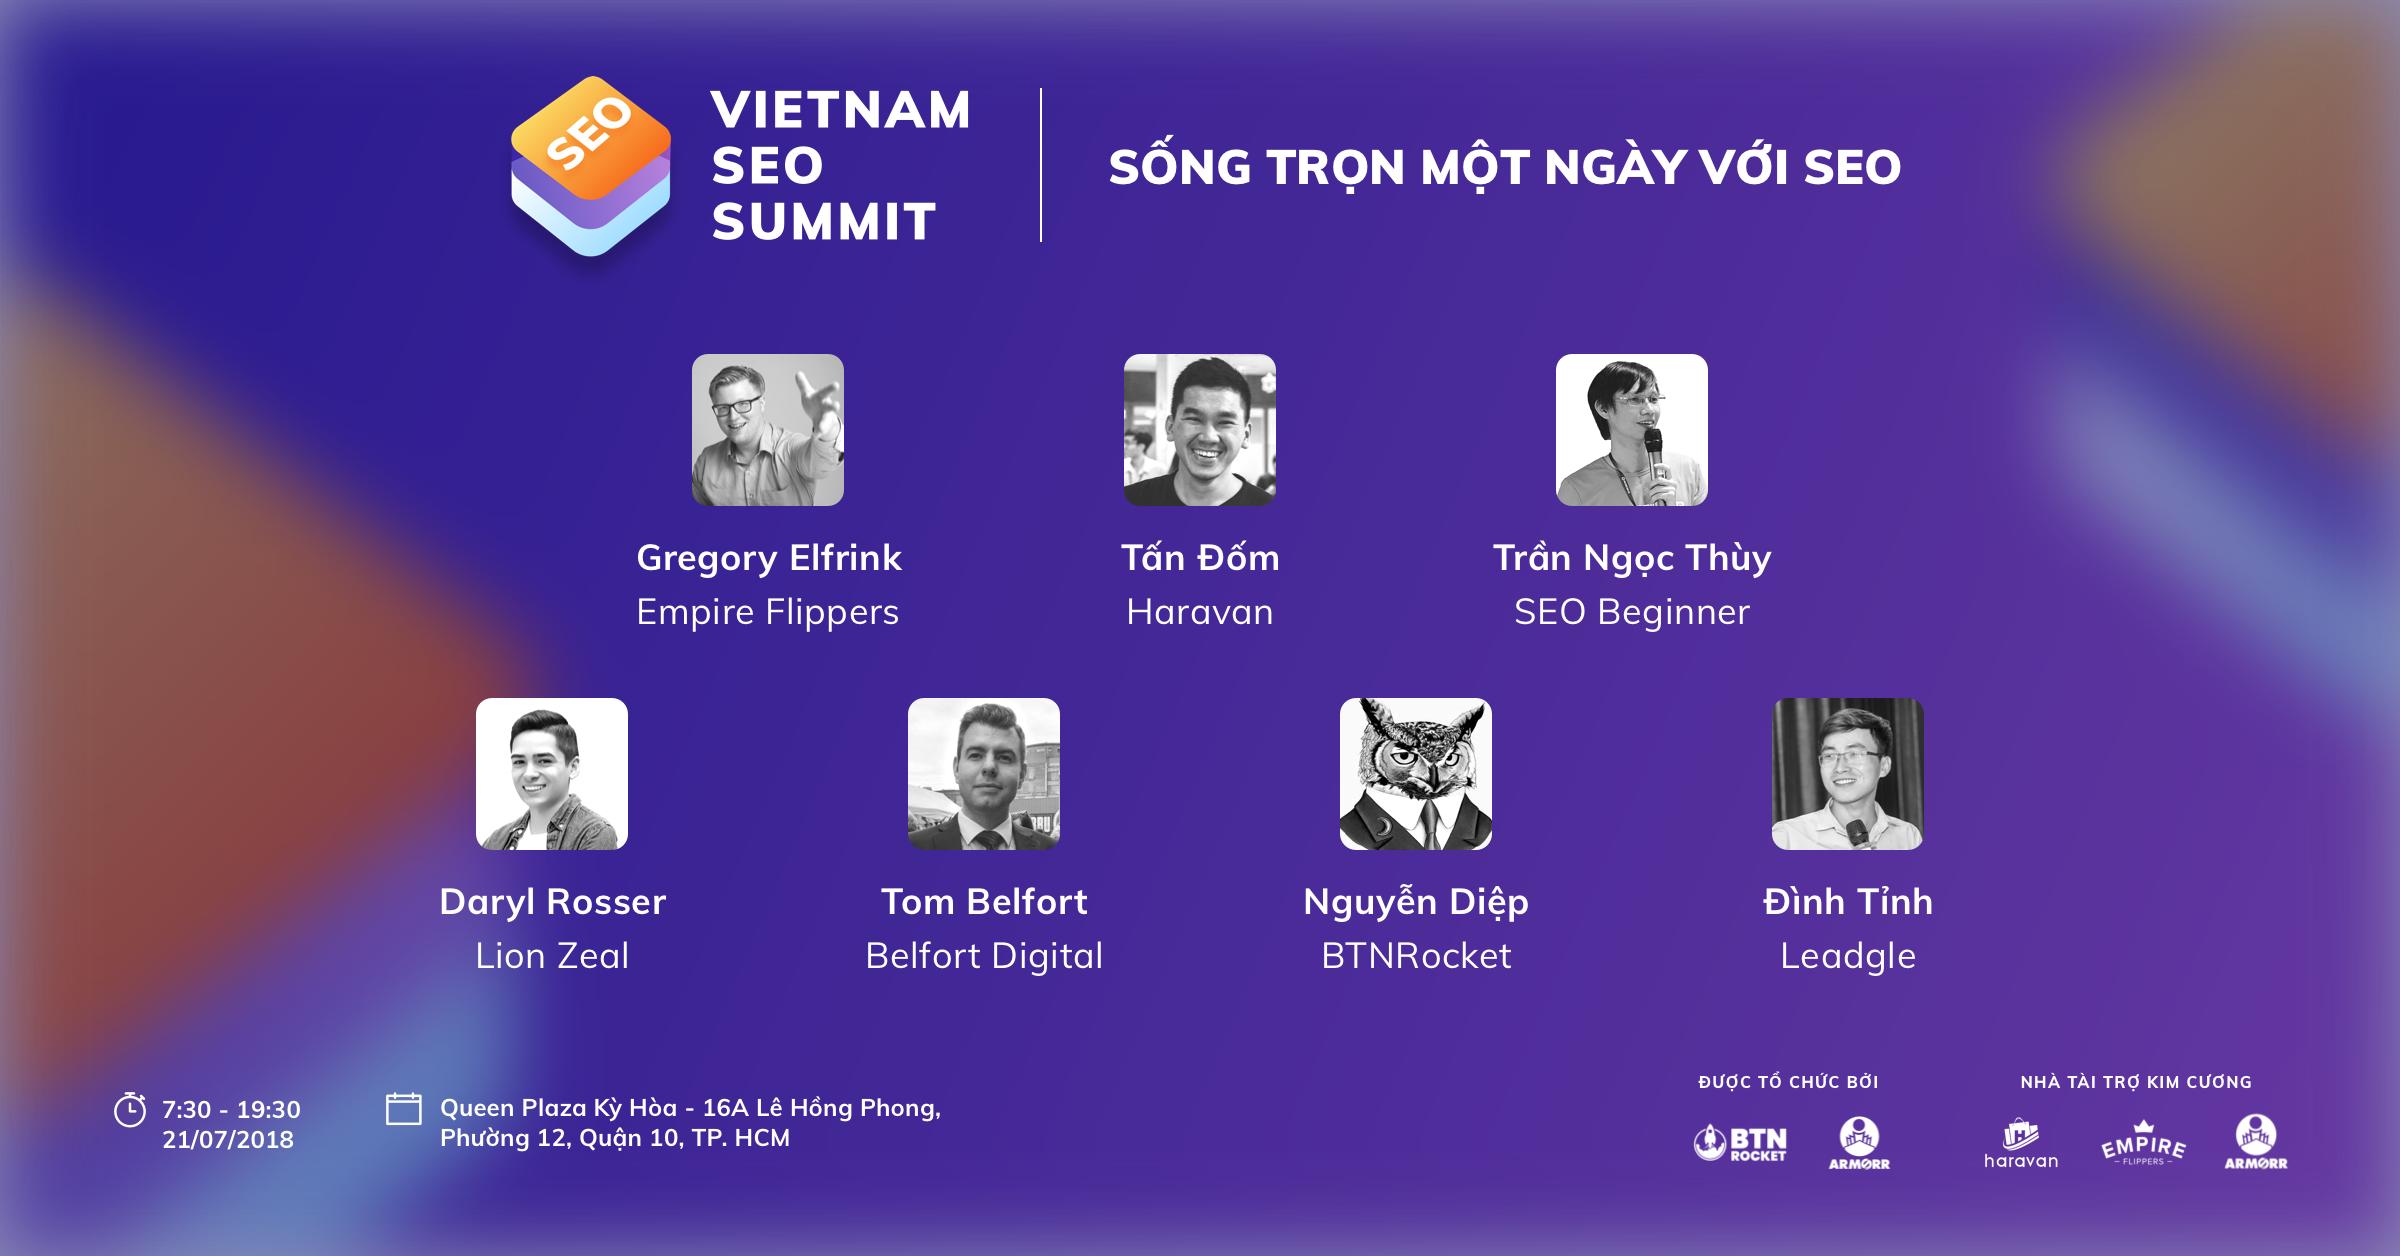 Vietnam SEO Summit - Khai Phá Sức Mạnh SEO Trong Digital